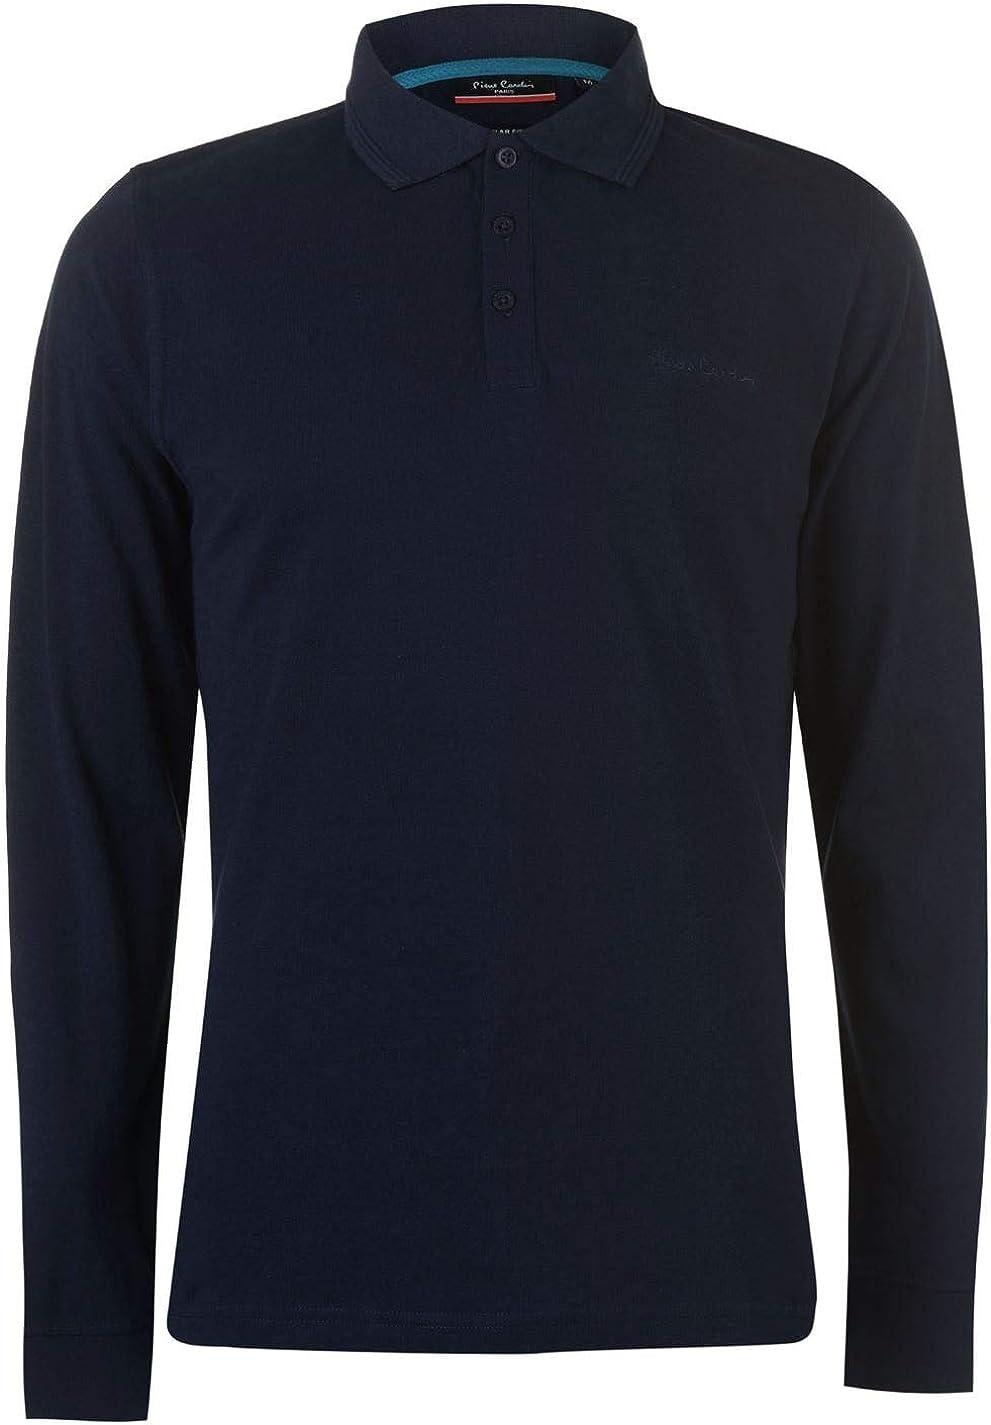 Pierre Cardin Mens Plain Polo Shirt Short Sleeve